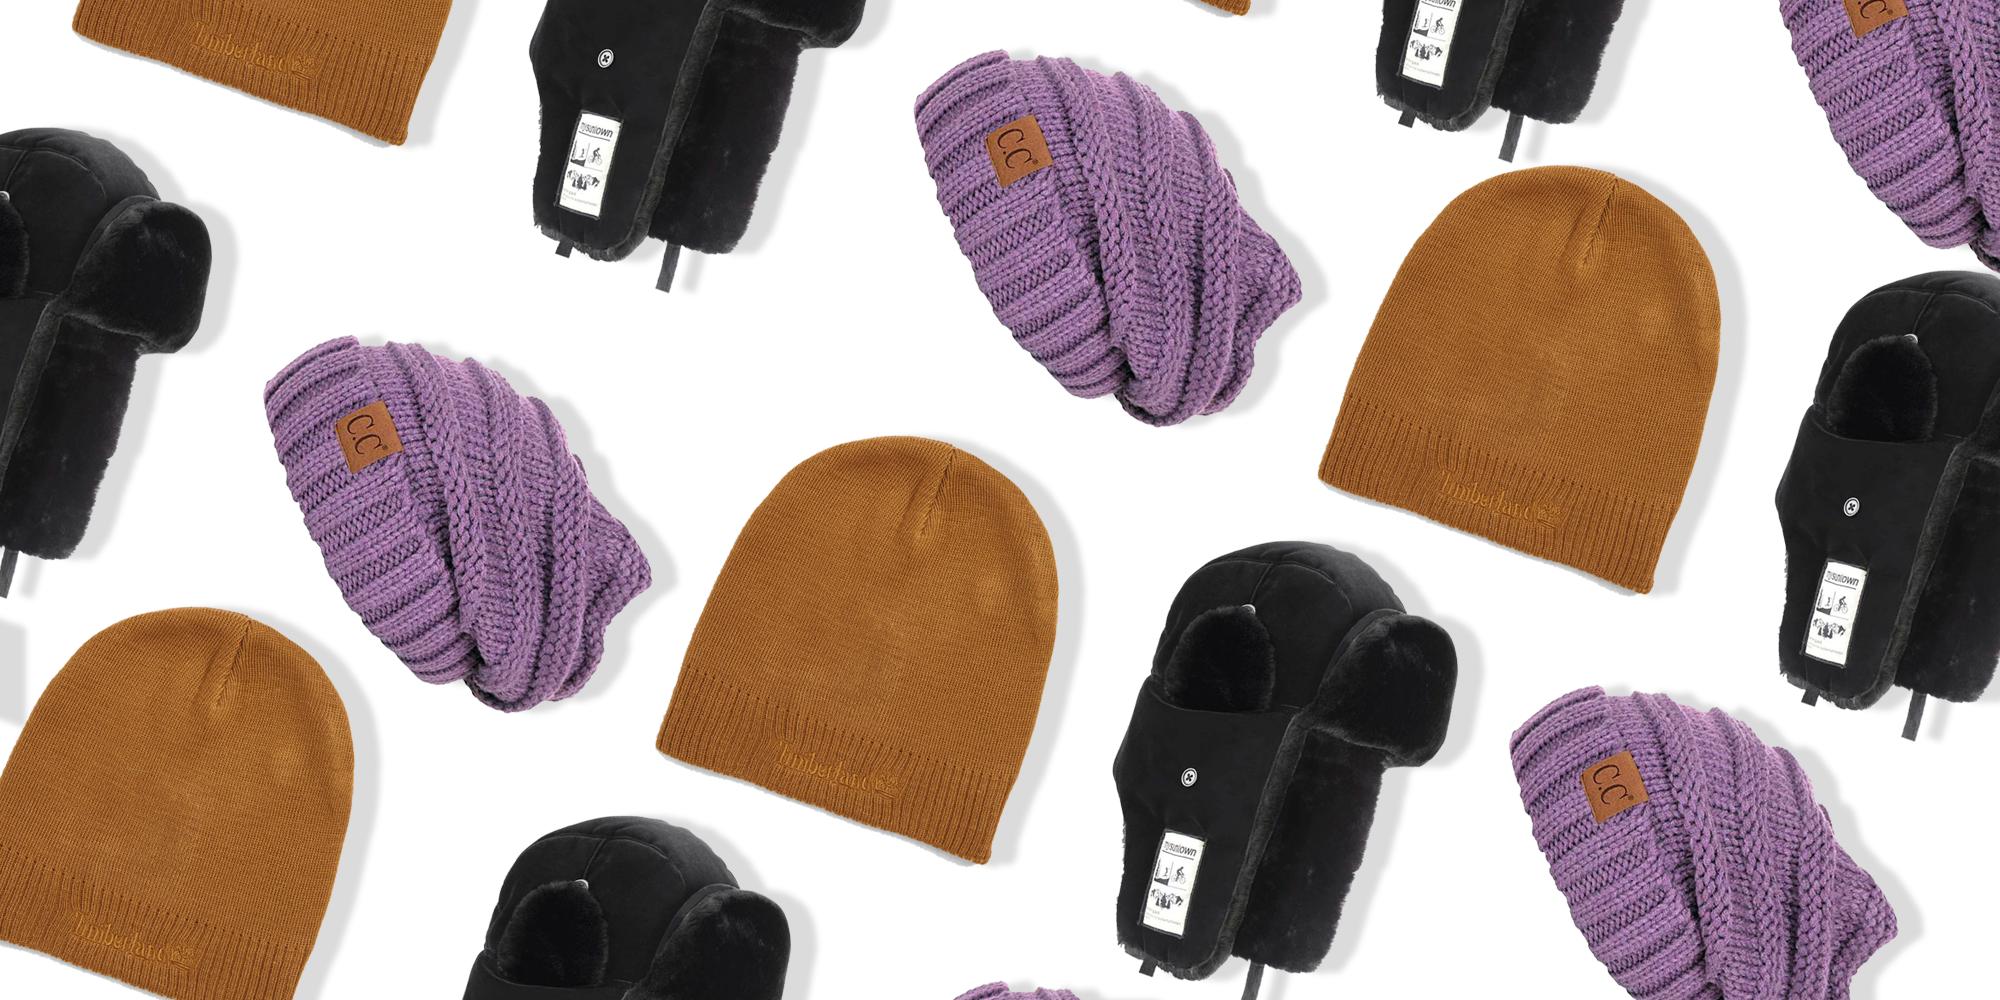 12 Warm Winter Hats That Don't Sacrifice Style